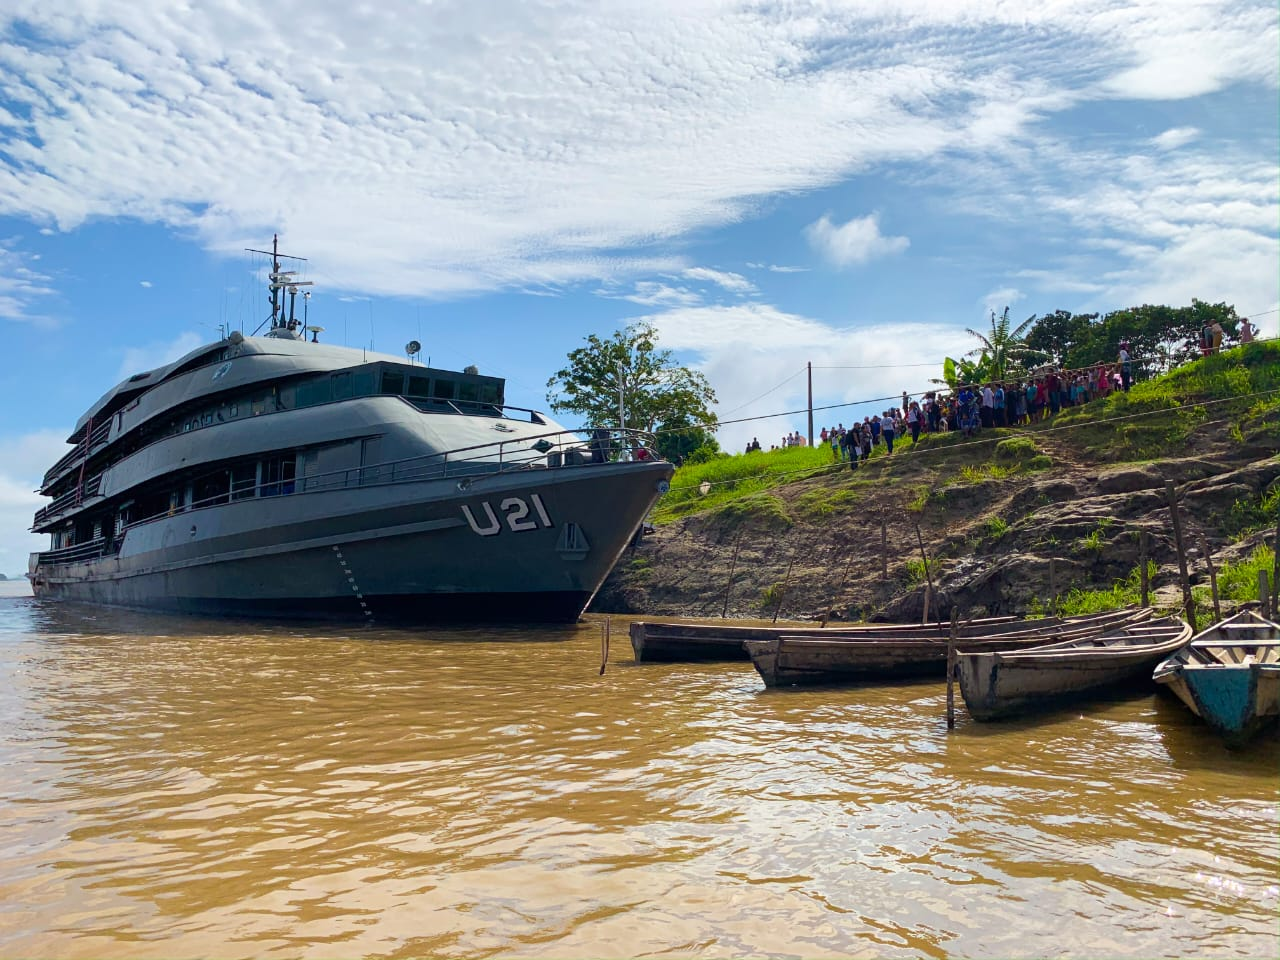 navio marinha atracado no amazonas